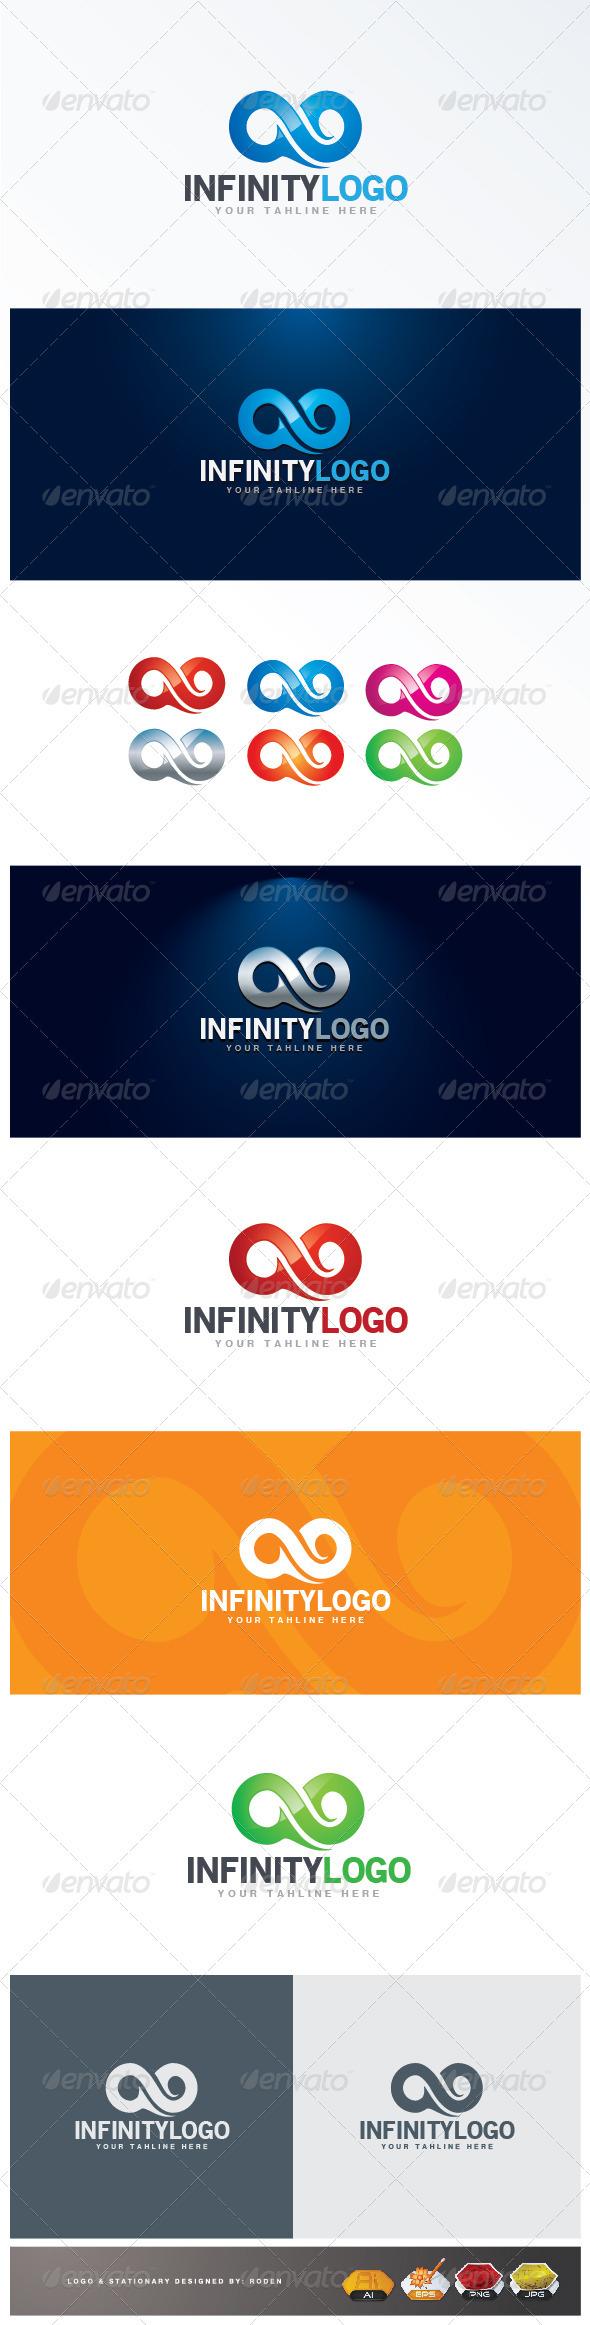 GraphicRiver Infinity logo 3289137